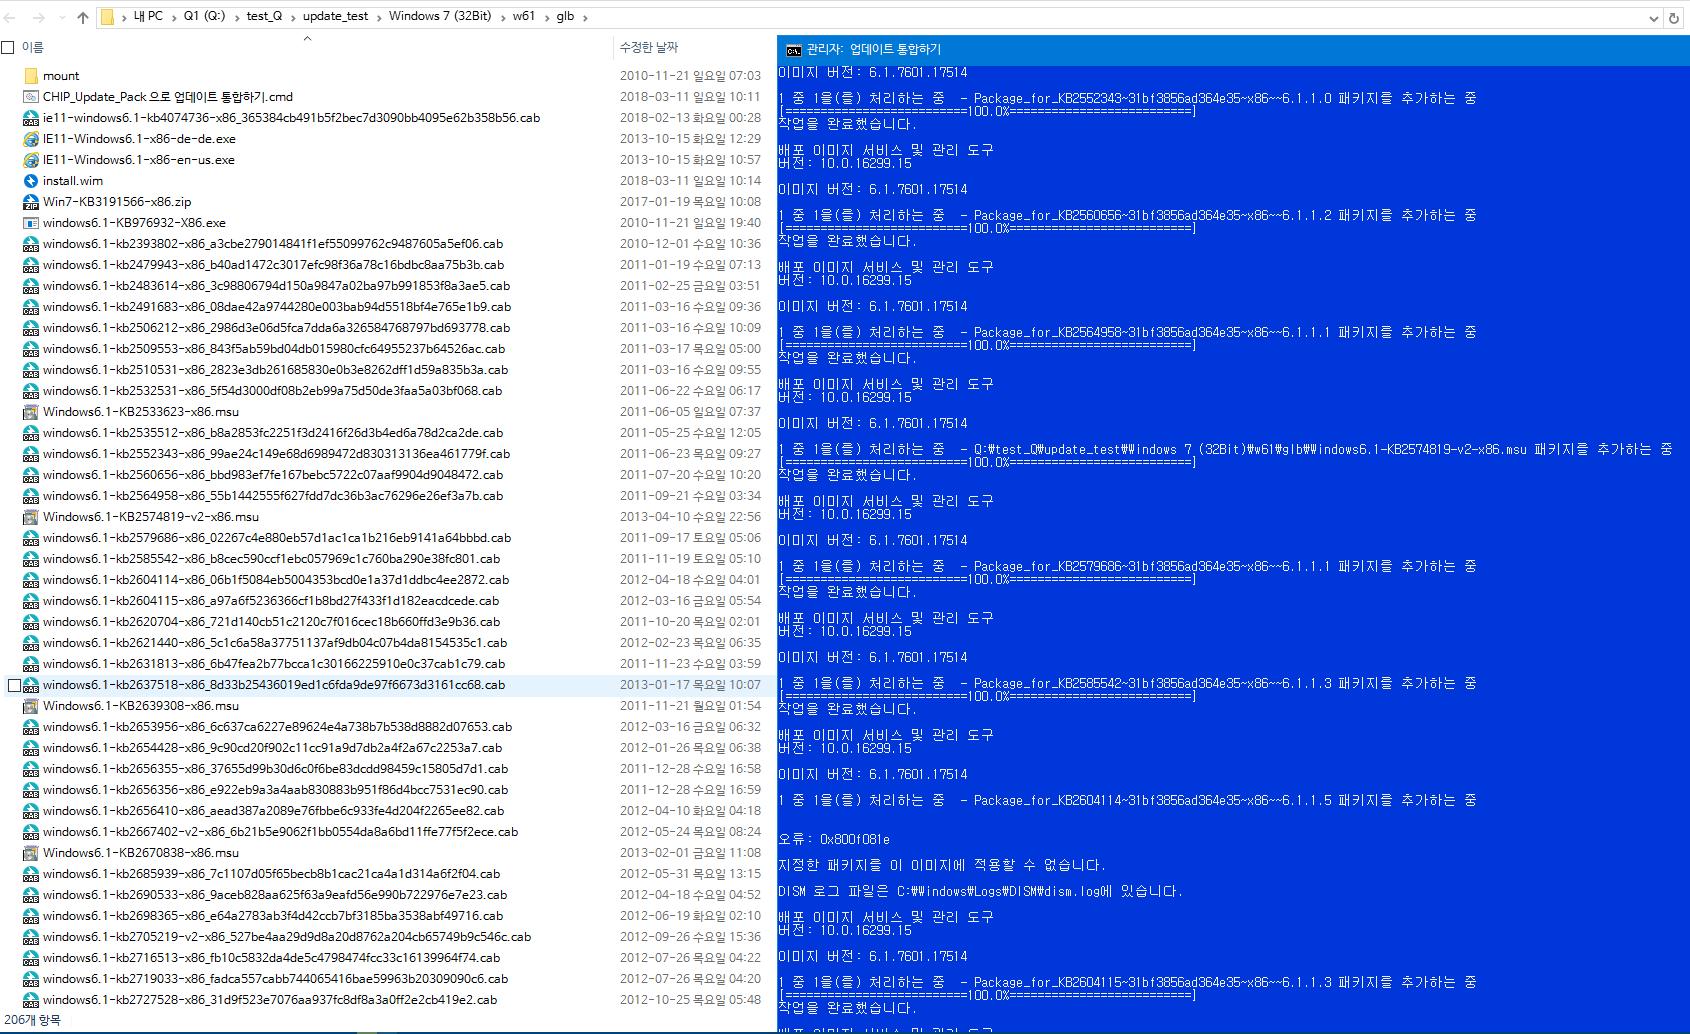 CHIP_Update_Pack_Februar 업데이트팩 통합 테스트 중입니다 - 제가 대략 만든 통합 bat 파일 사용 2018-03-11_101550.png